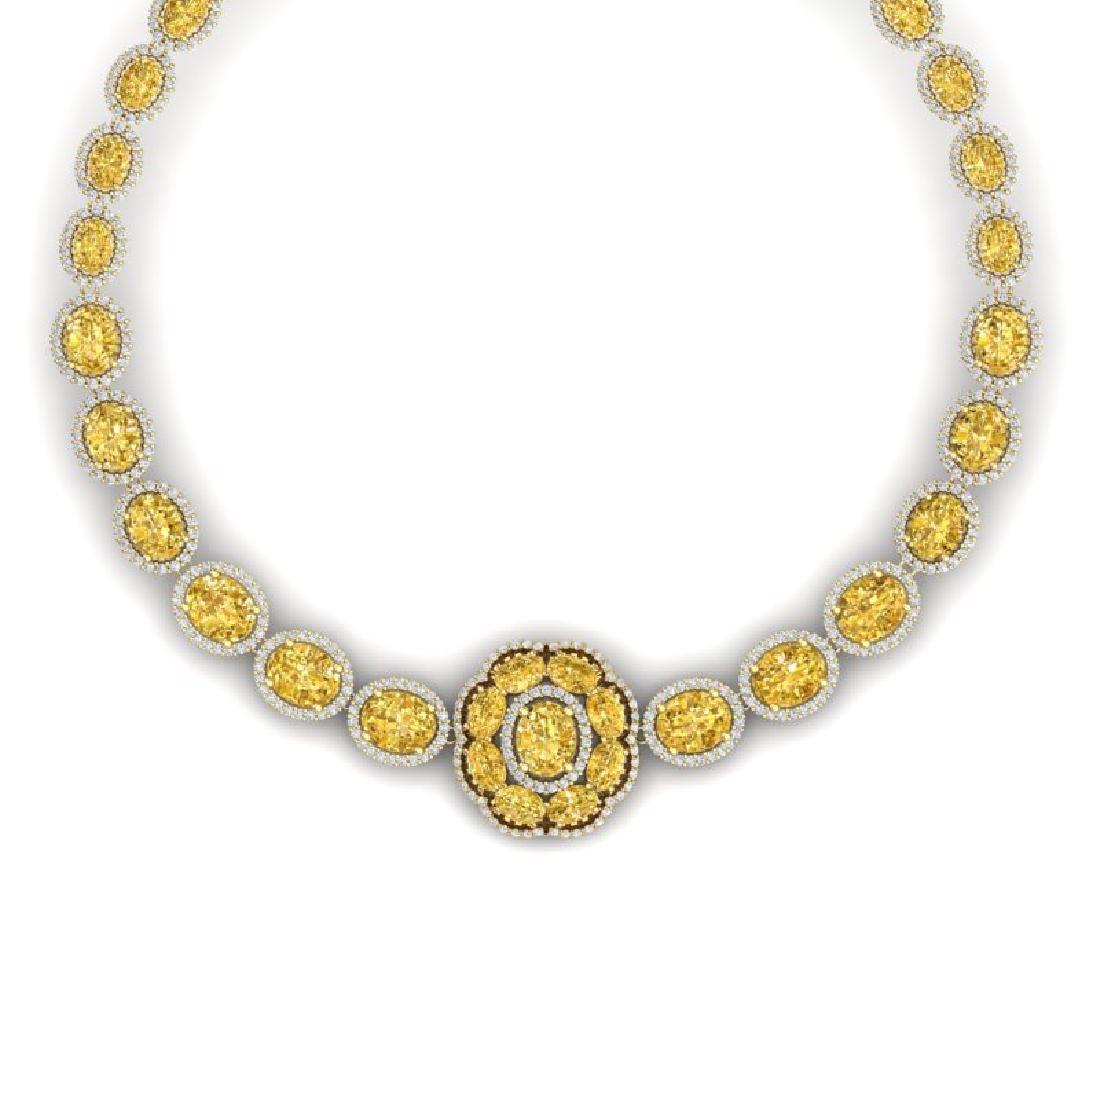 51.37 CTW Royalty Canary Citrine & VS Diamond Necklace